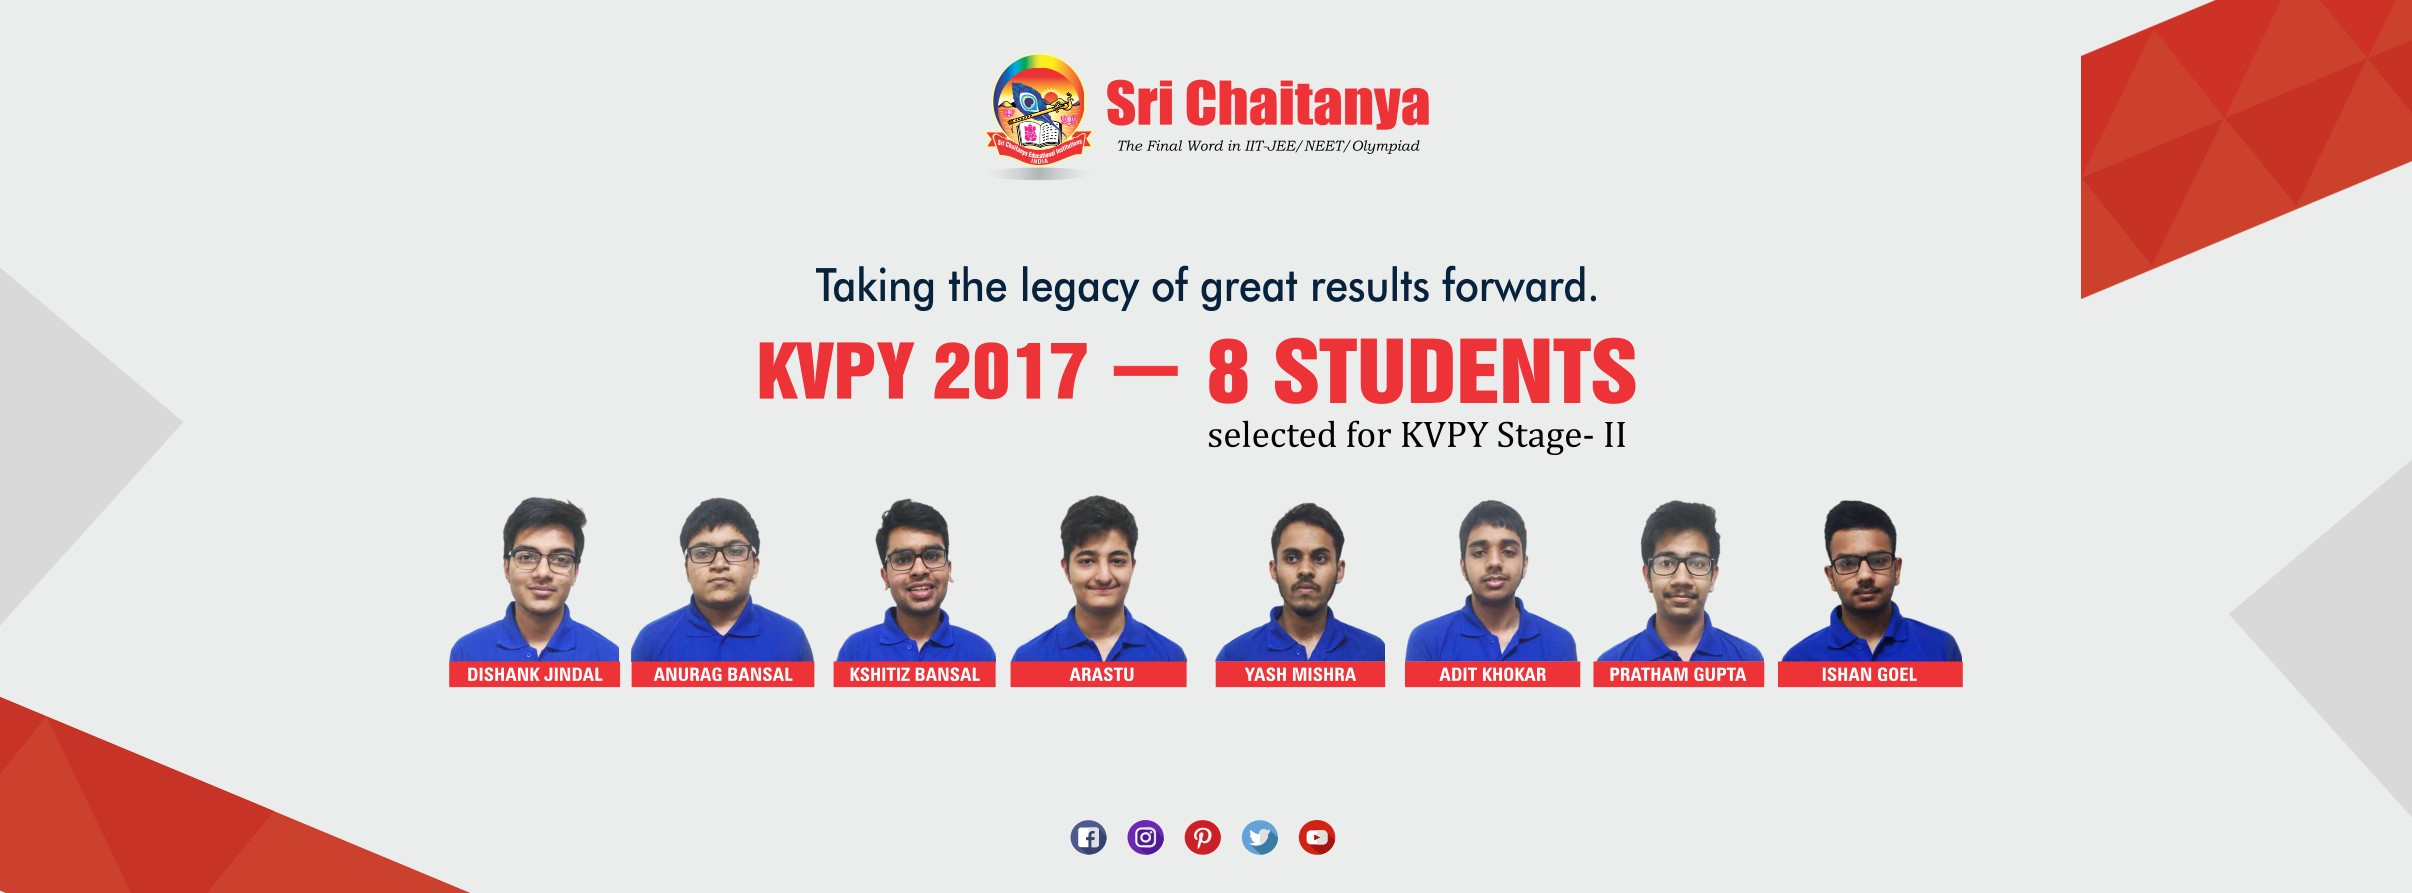 Sri Chaitanya Educational Institution, Chandigarh | LinkedIn